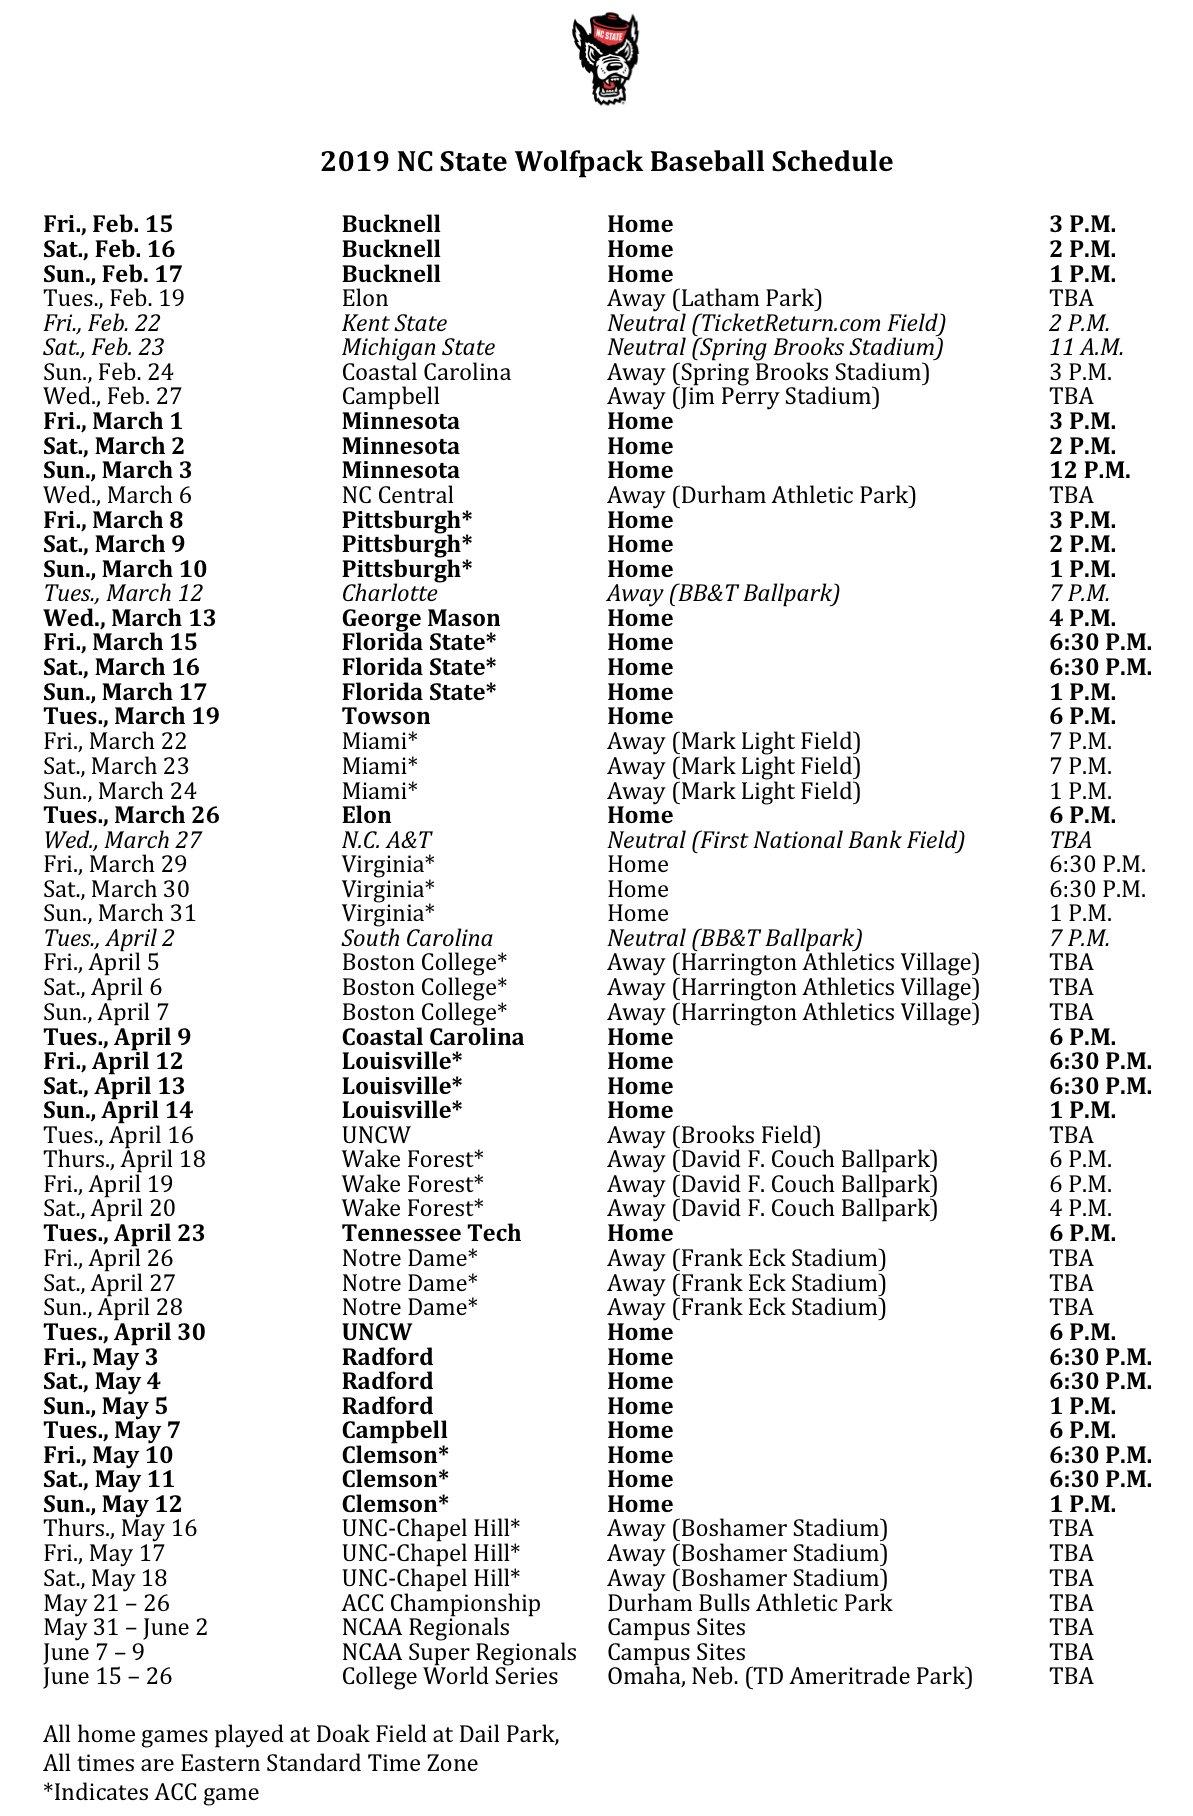 Nc State Releases 2019 Baseball Schedule - Pack Insider Calendar 2019 Ncsu